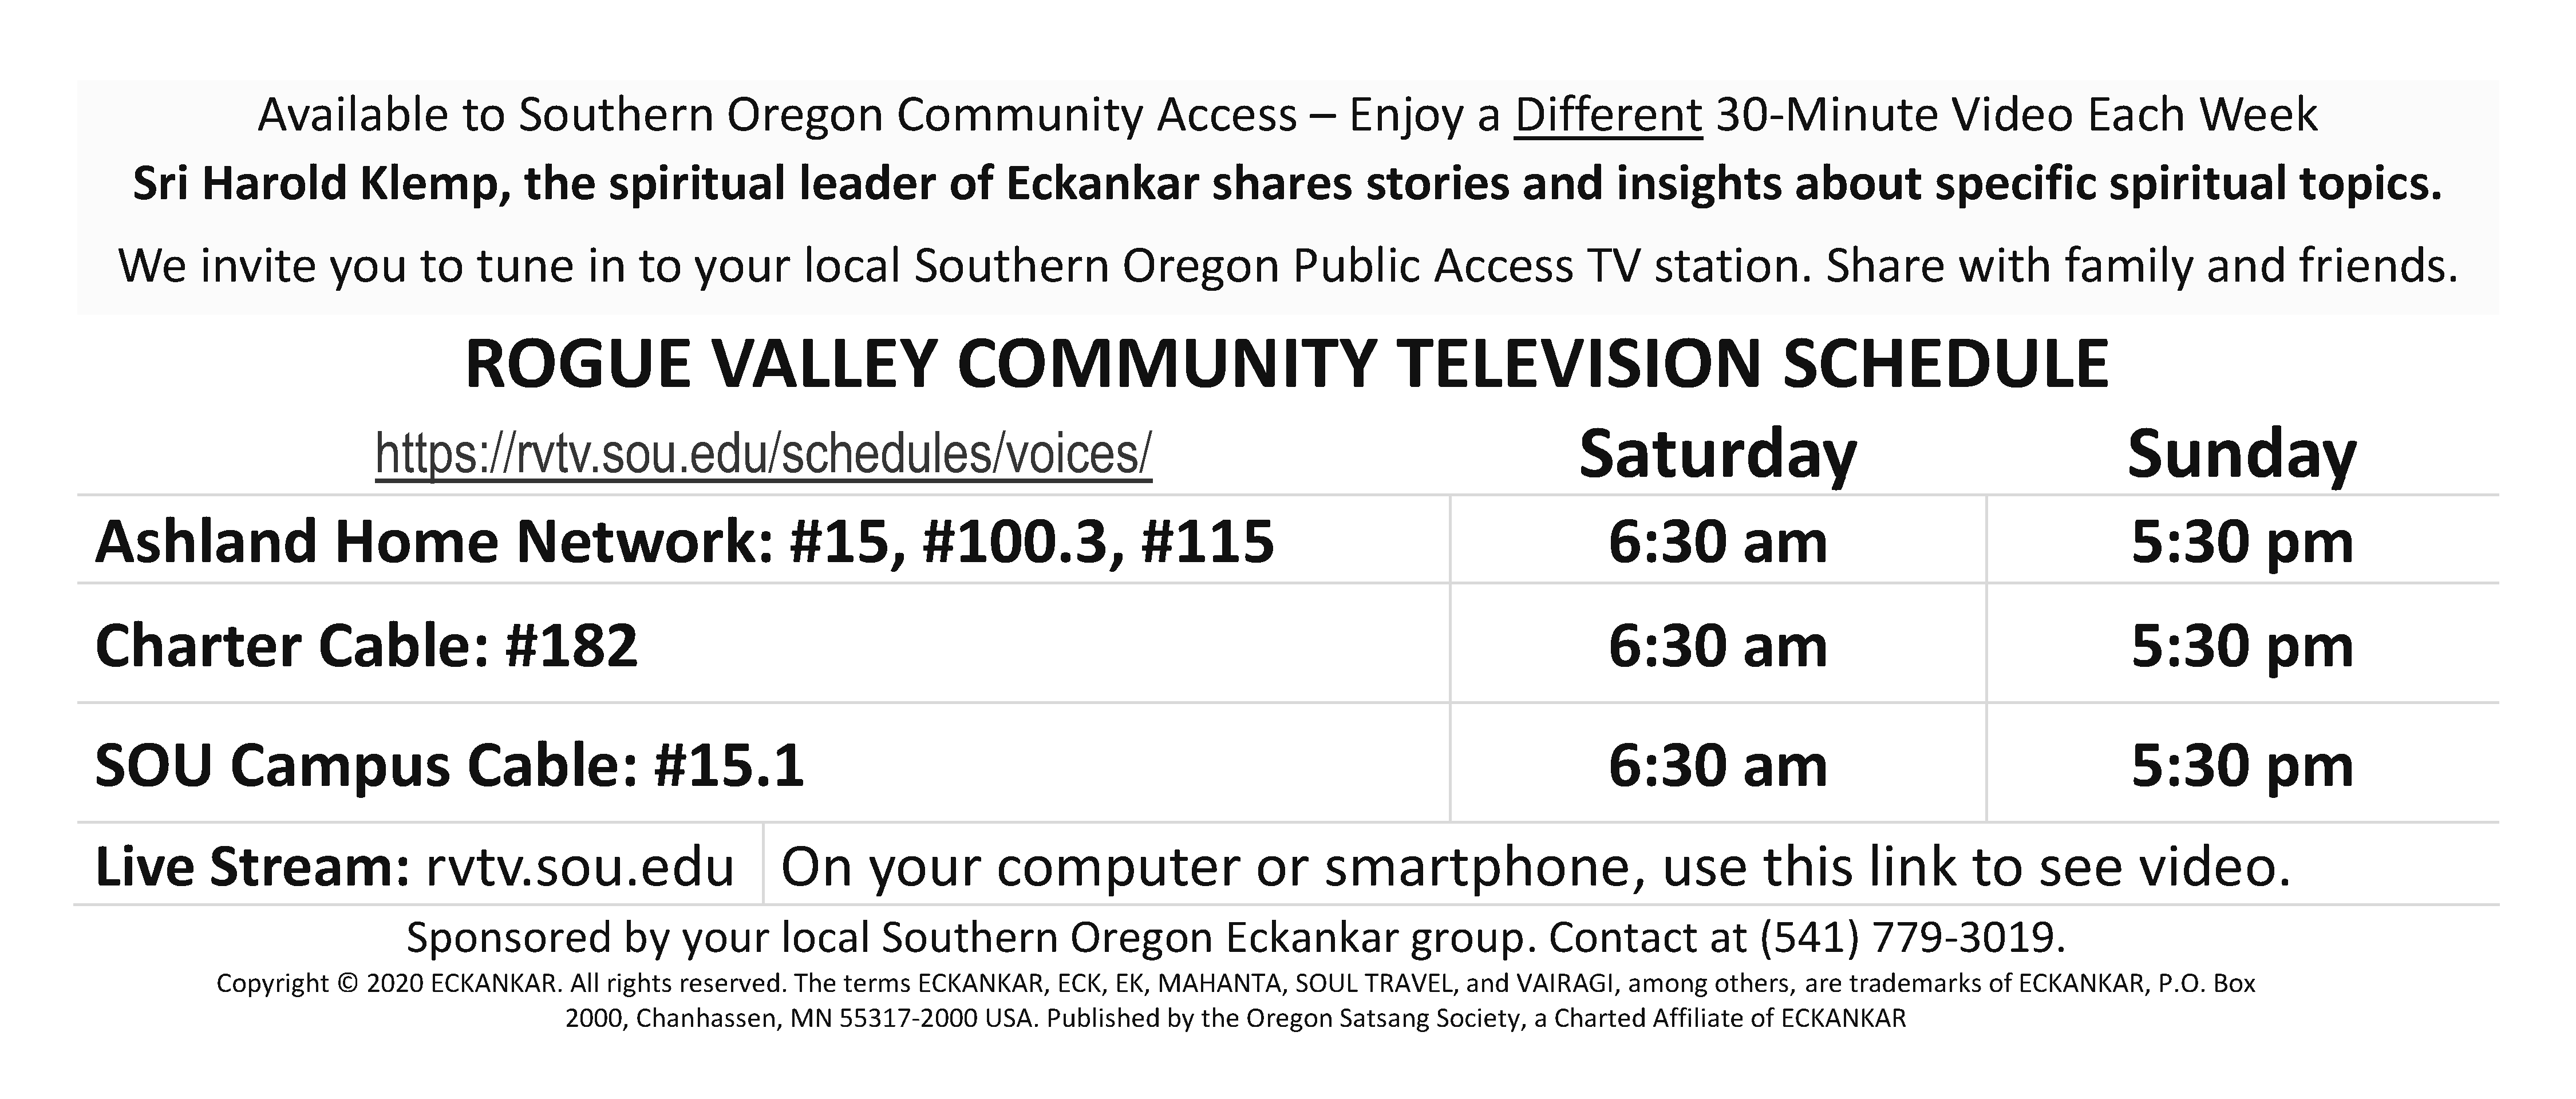 RVTV Southern-Oregon ECK Public TV Scehdules 2020-5-31_BW